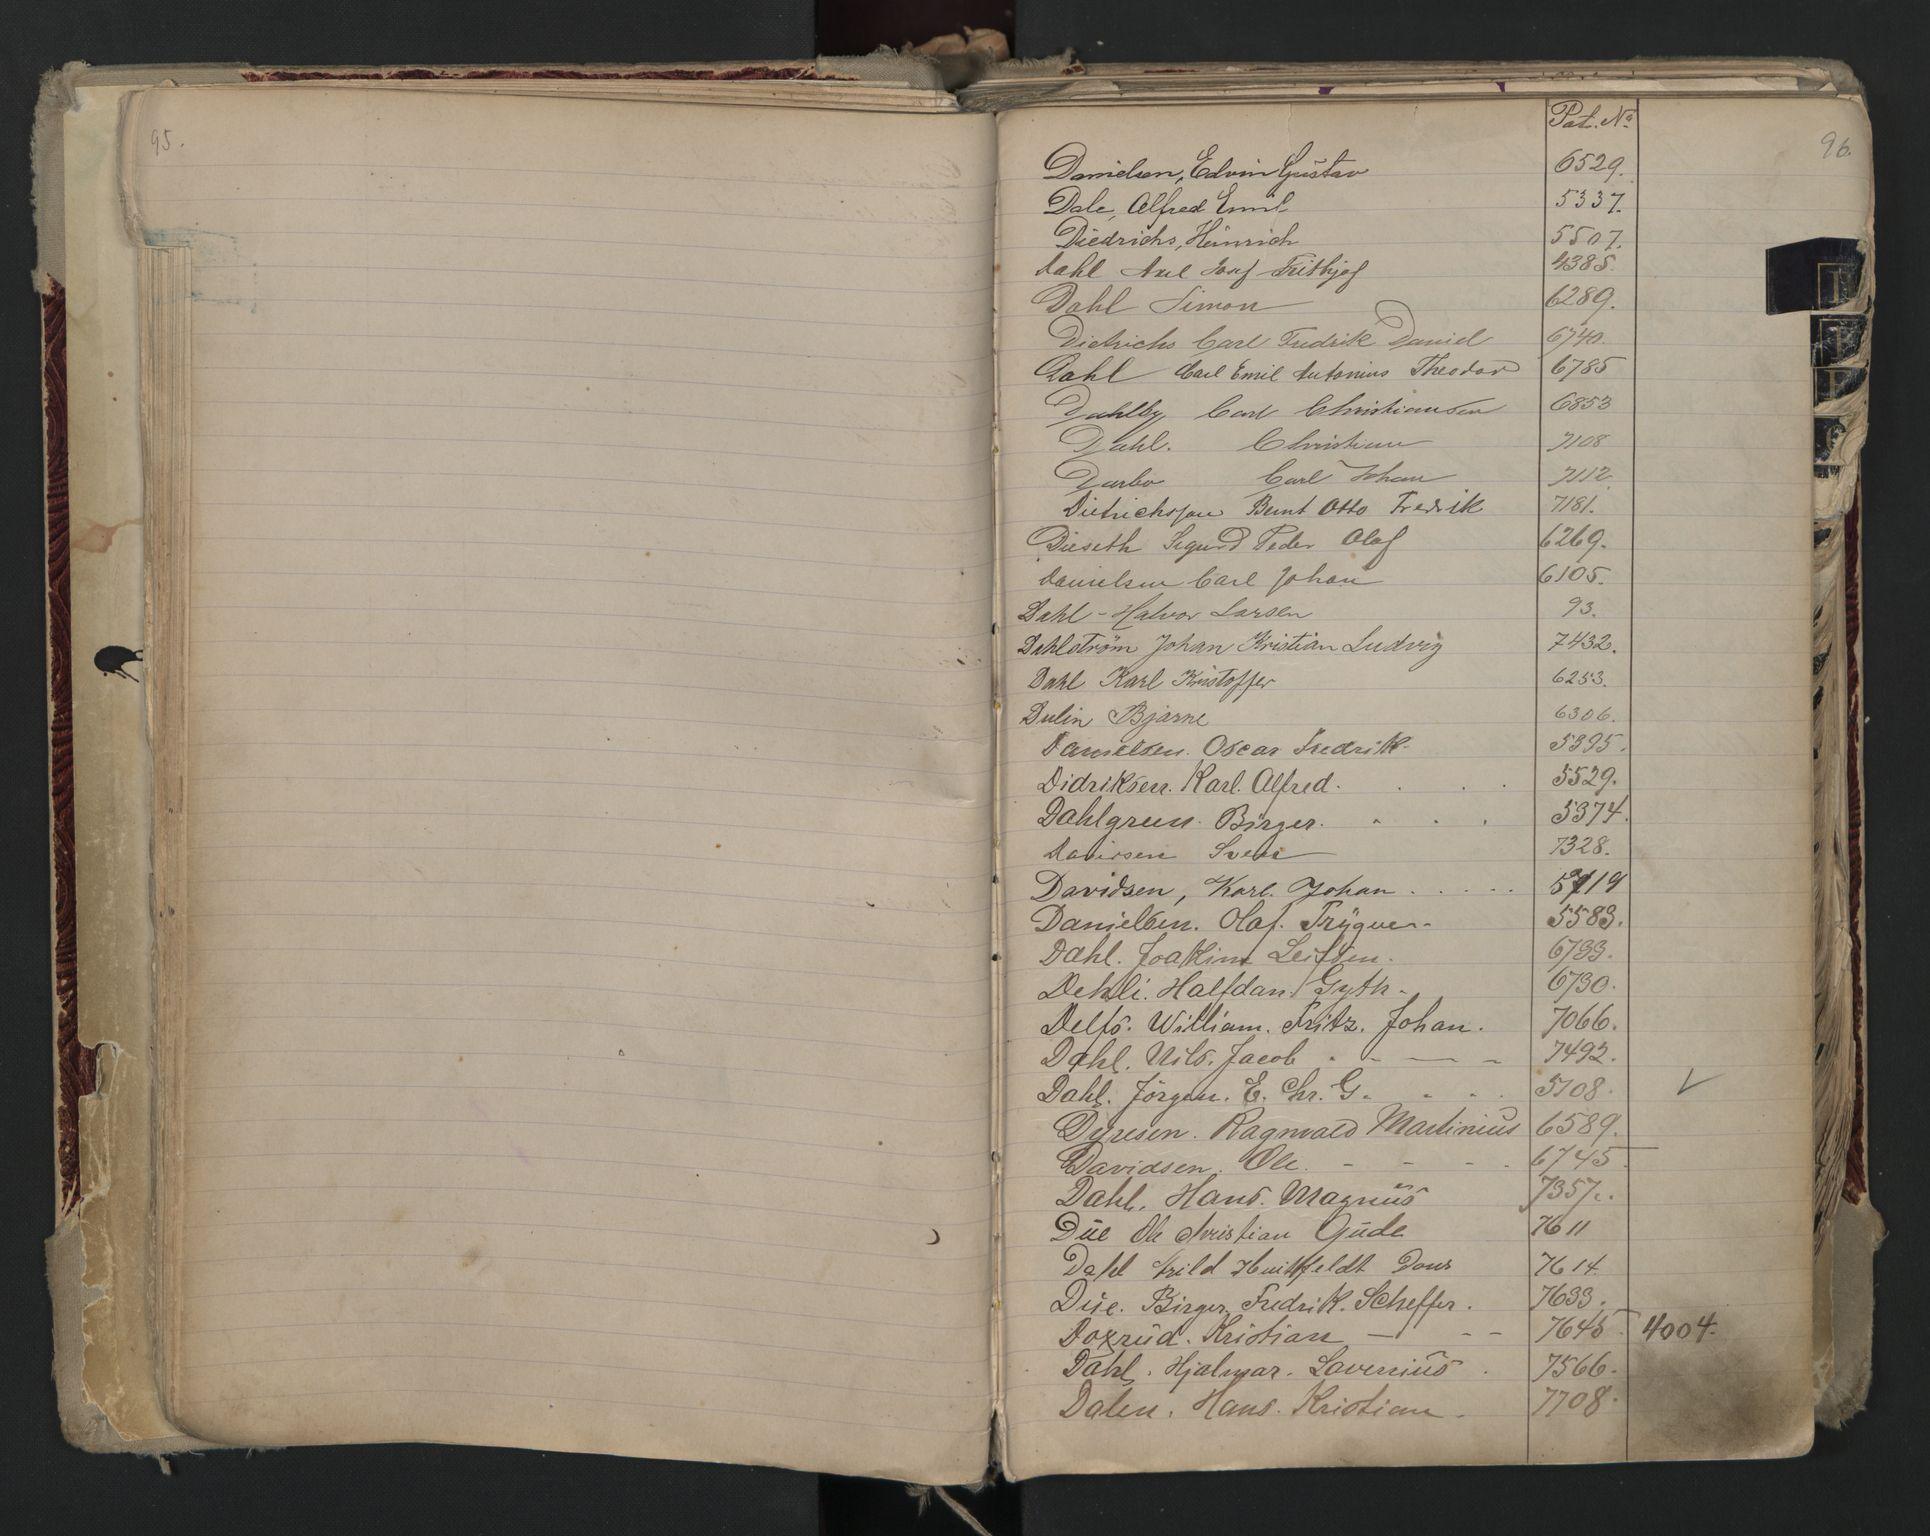 SAO, Oslo sjømannskontor, F/Fa/L0002: Register for Kristiania krets, 1866-1930, s. 95-96